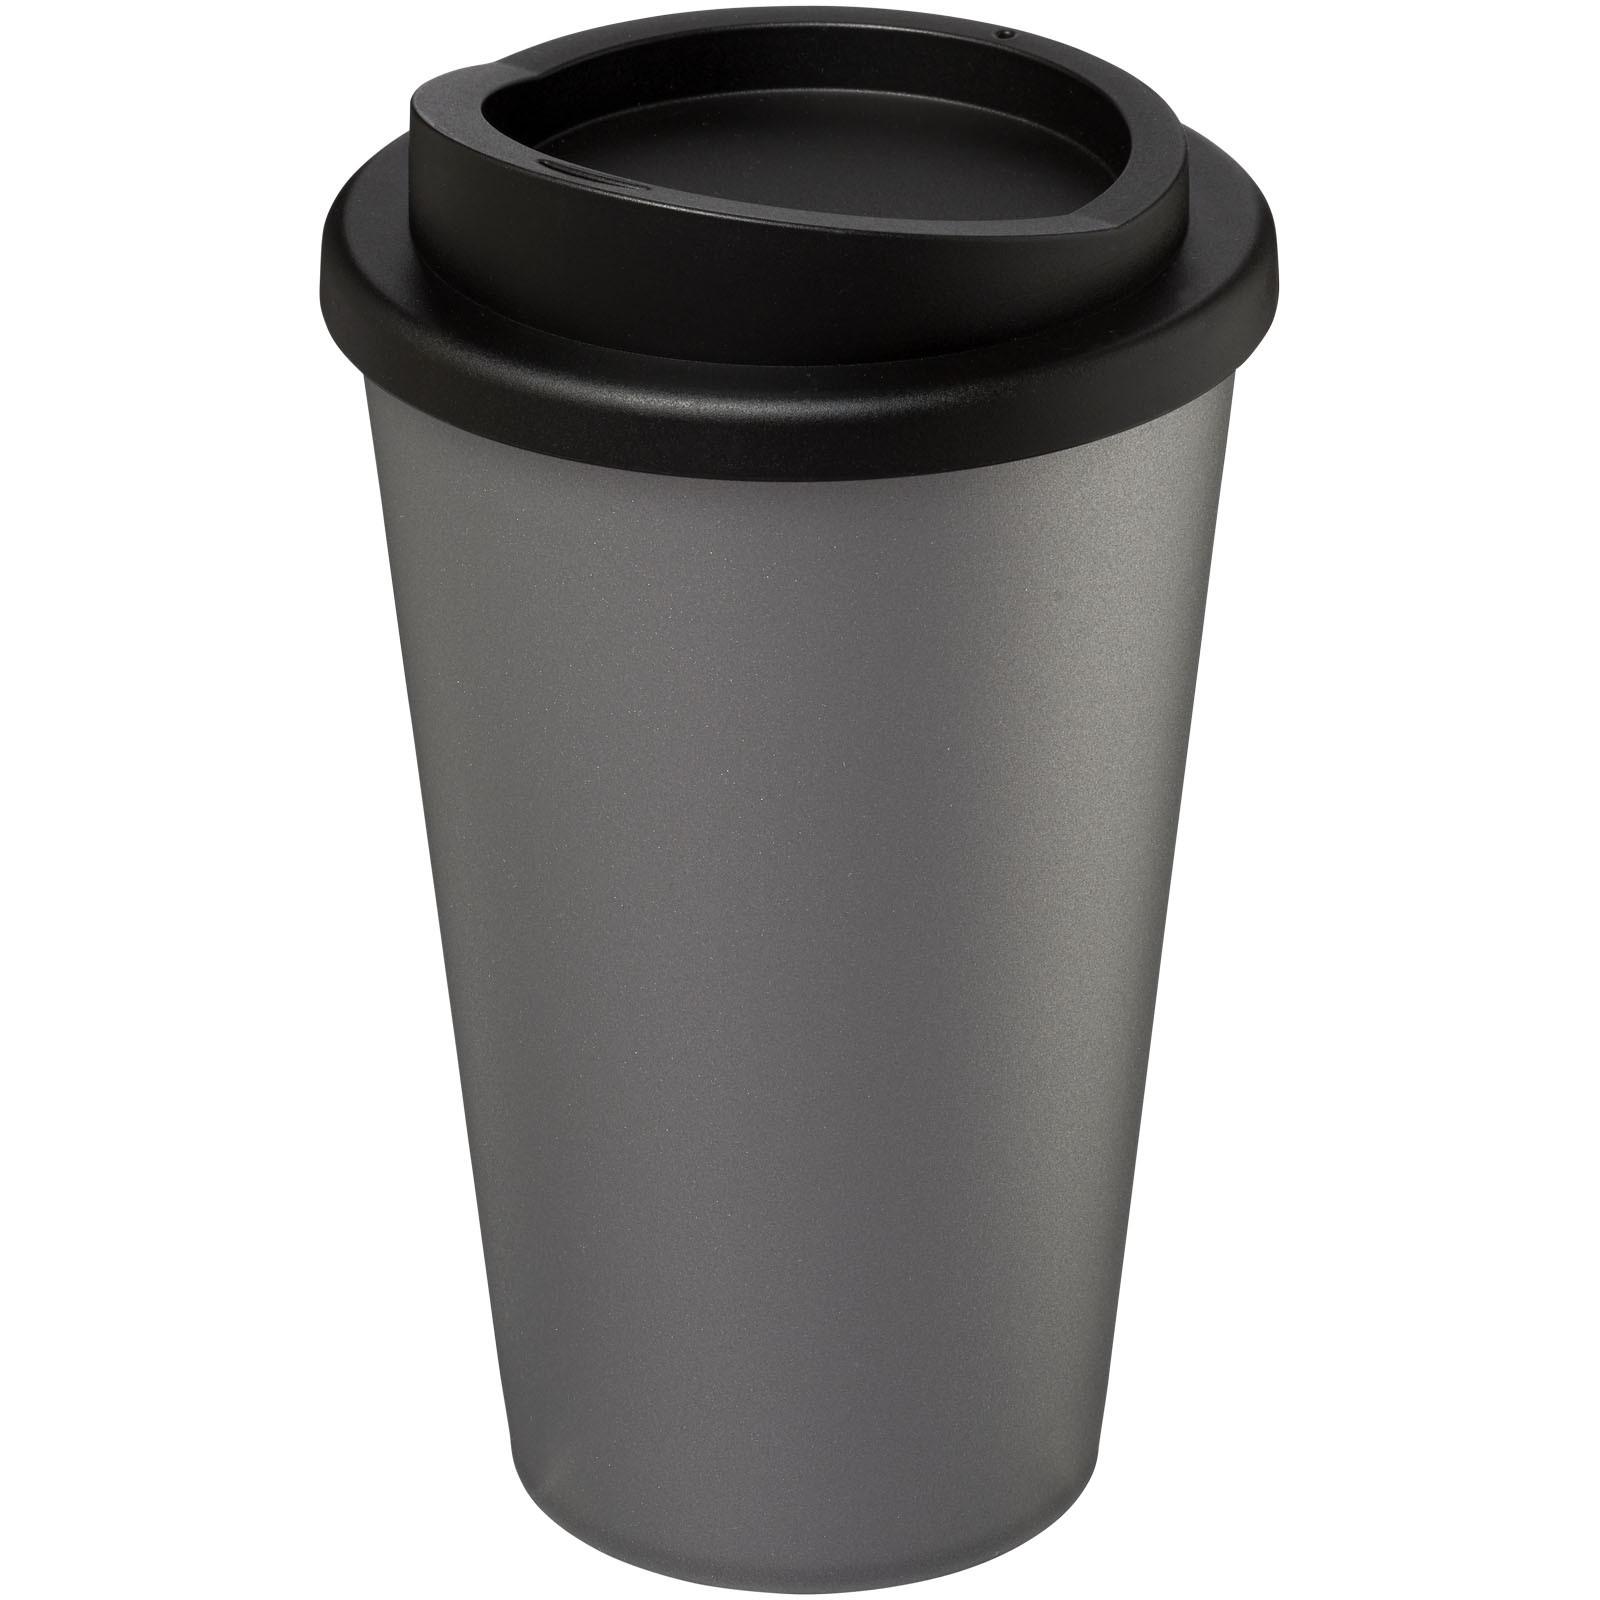 Americano® Vaso térmico de 350 ml - Plateado / Negro intenso